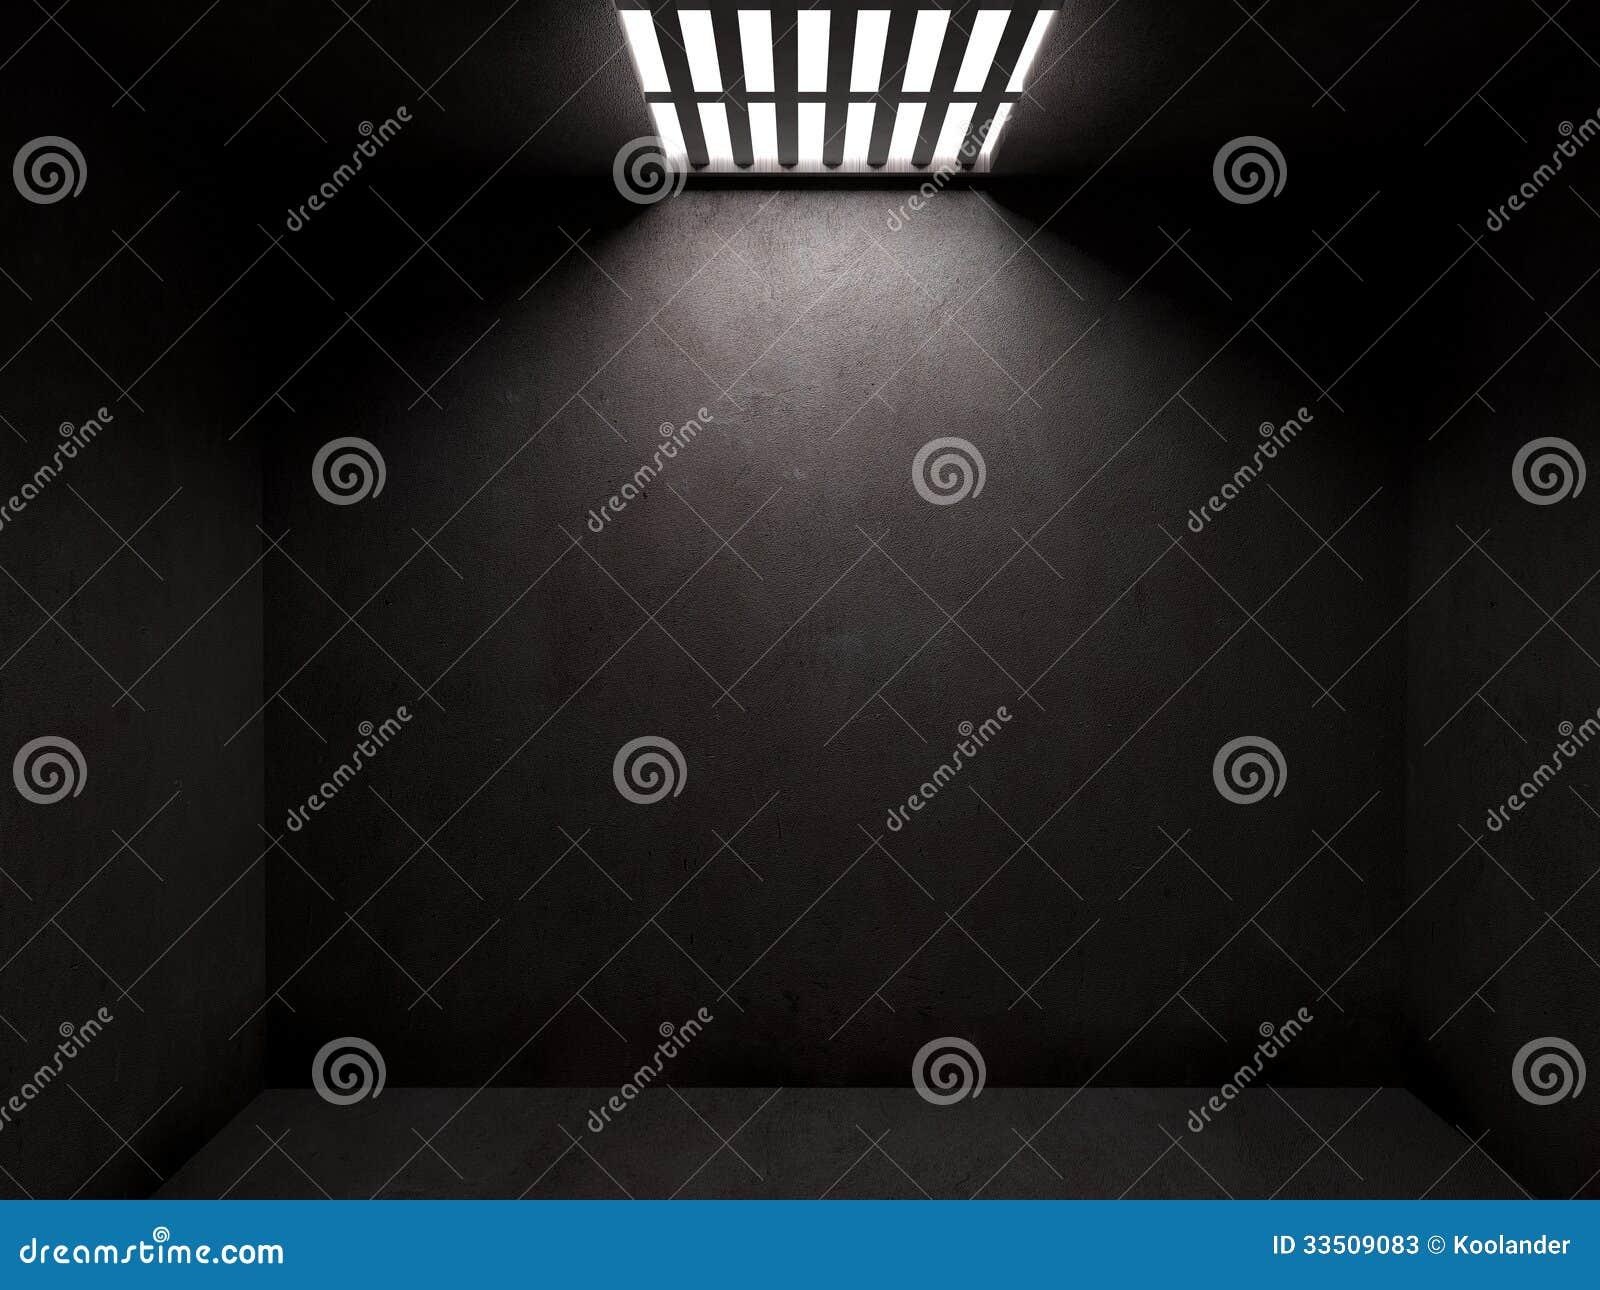 Dark Prison Cell Stock Photos - Image: 33509083